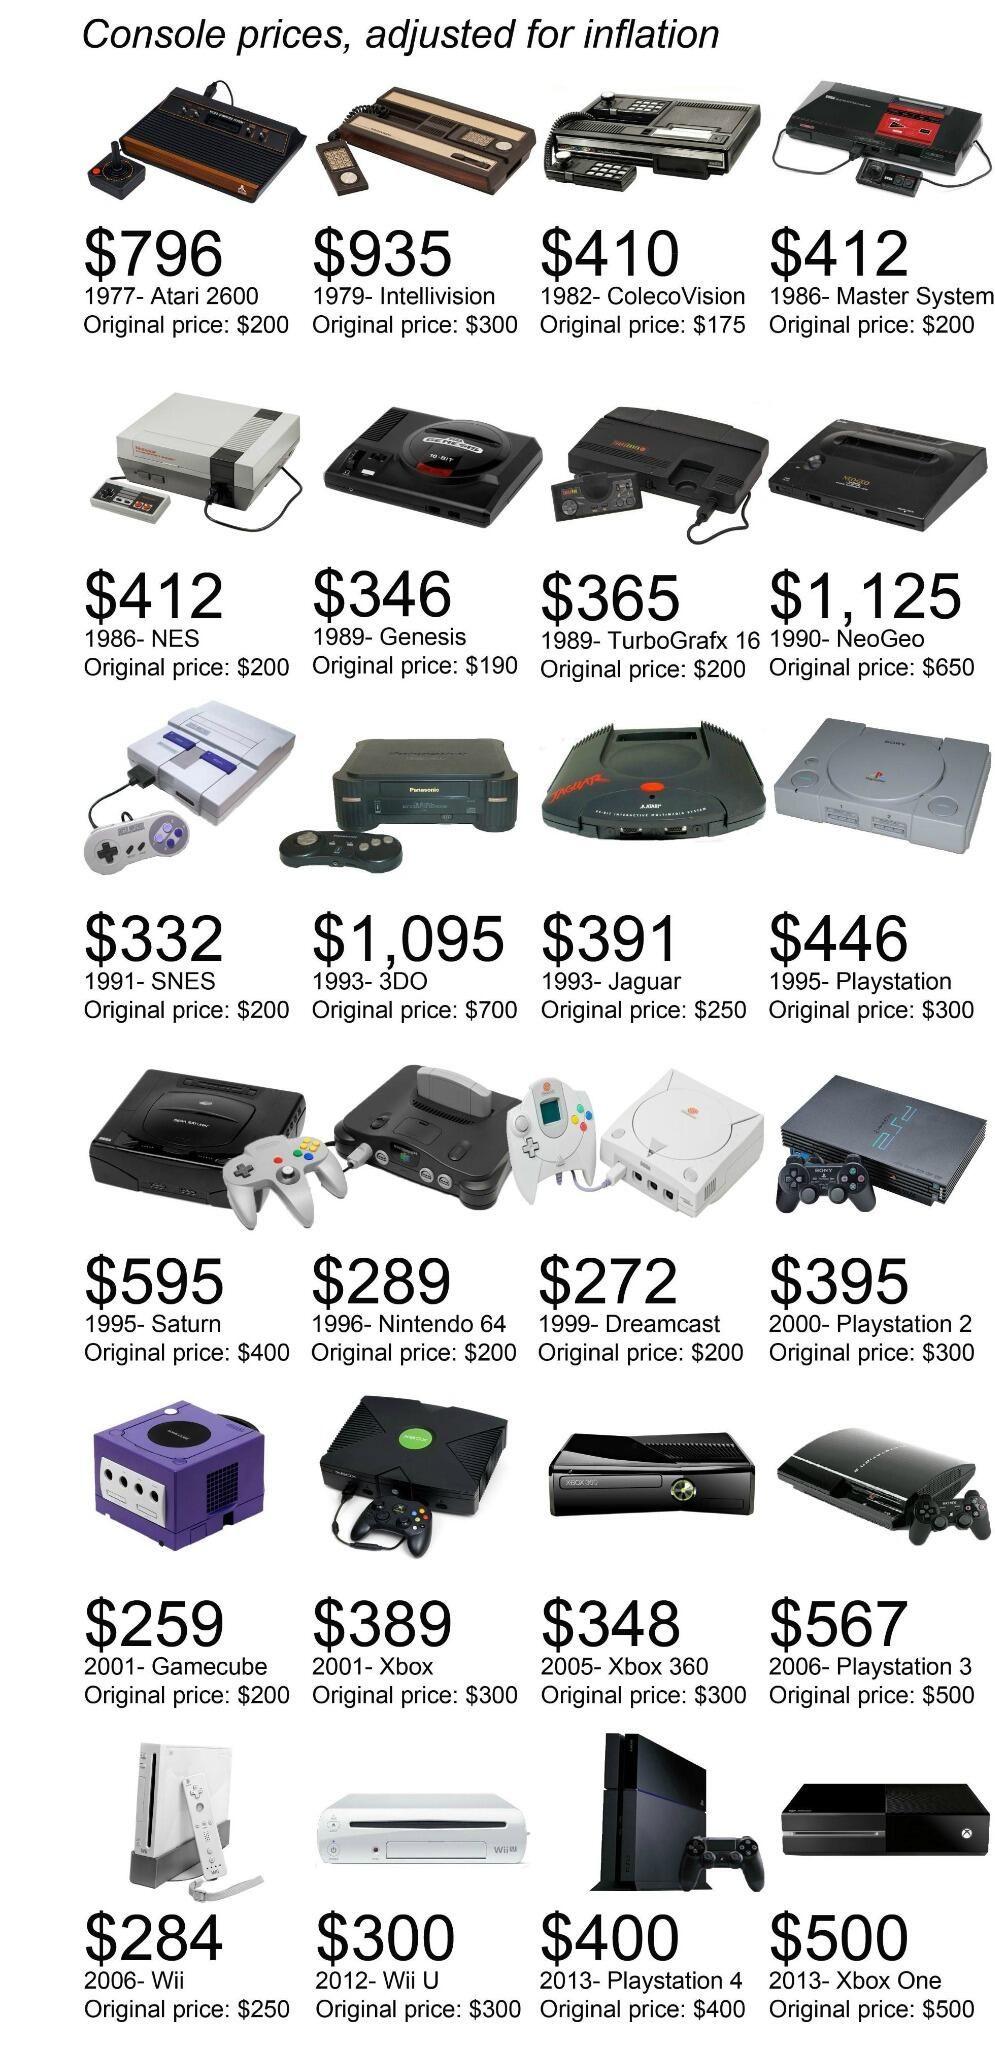 Console prices History #playstation #nintendo #sega #xbox